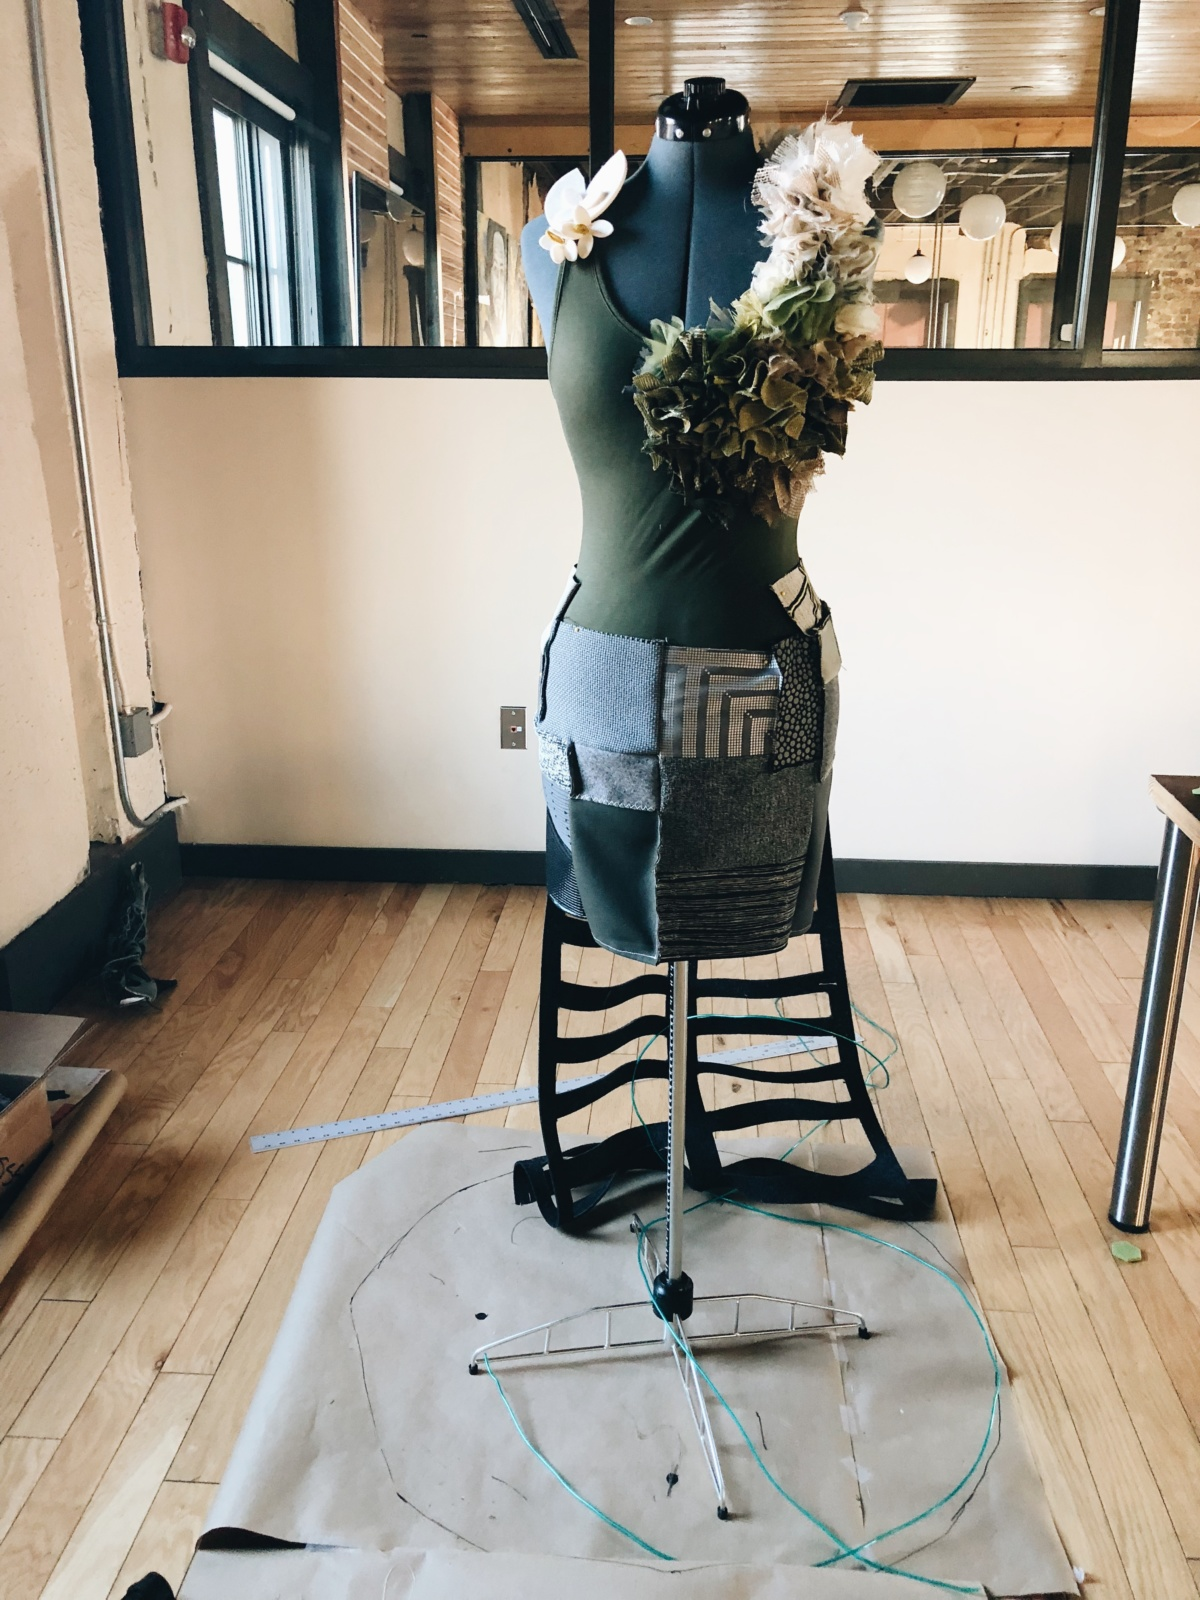 Garment process work